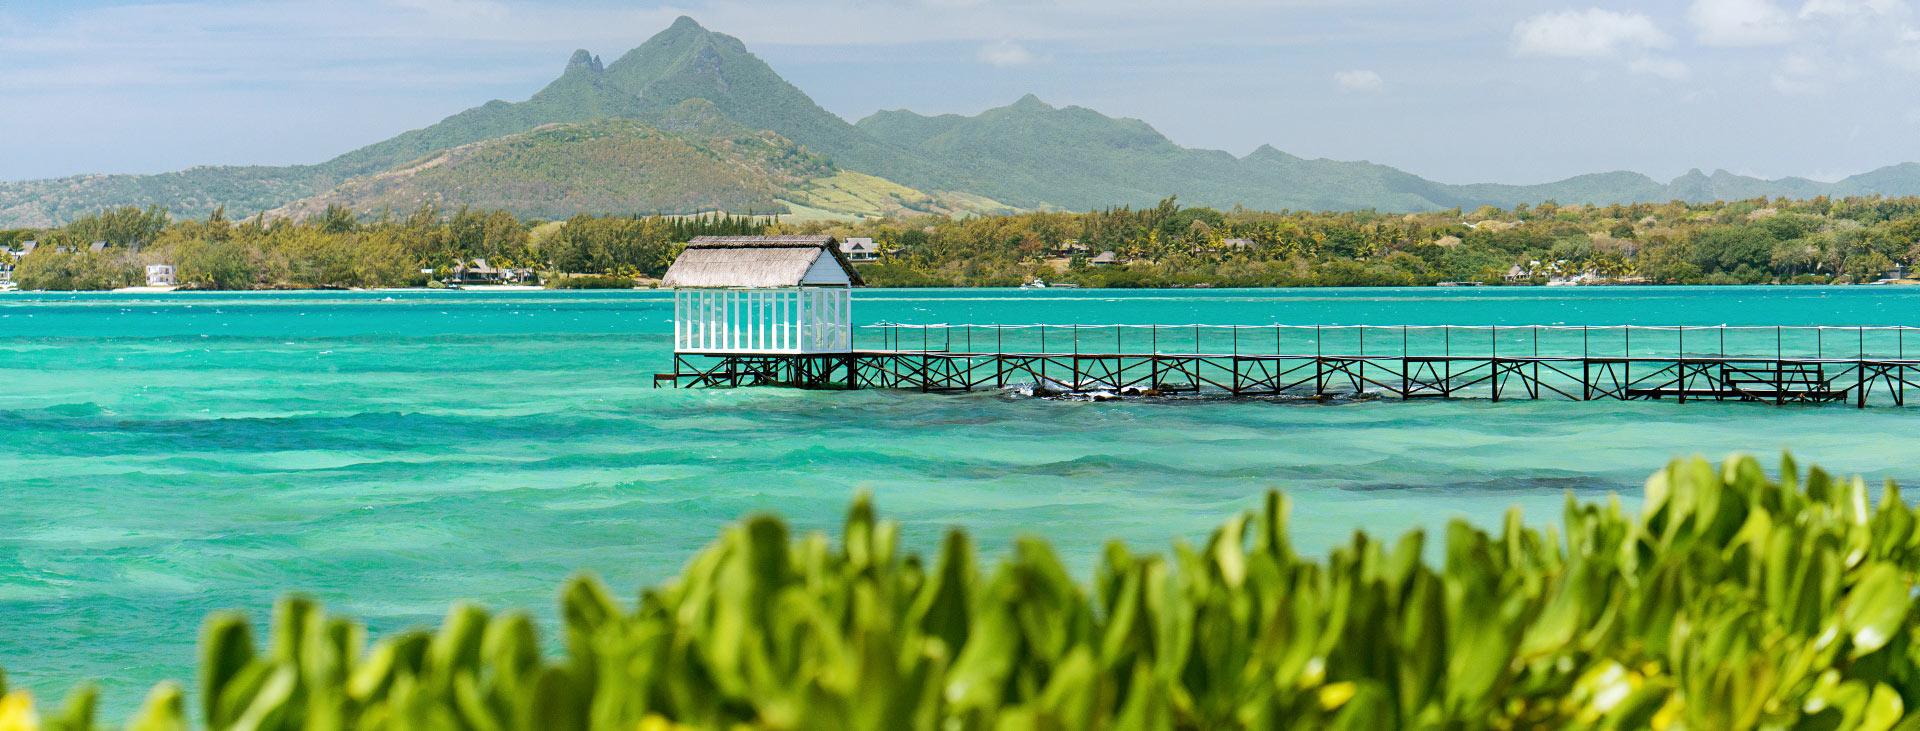 Tropical Attitude, Mauritius, Mauritius